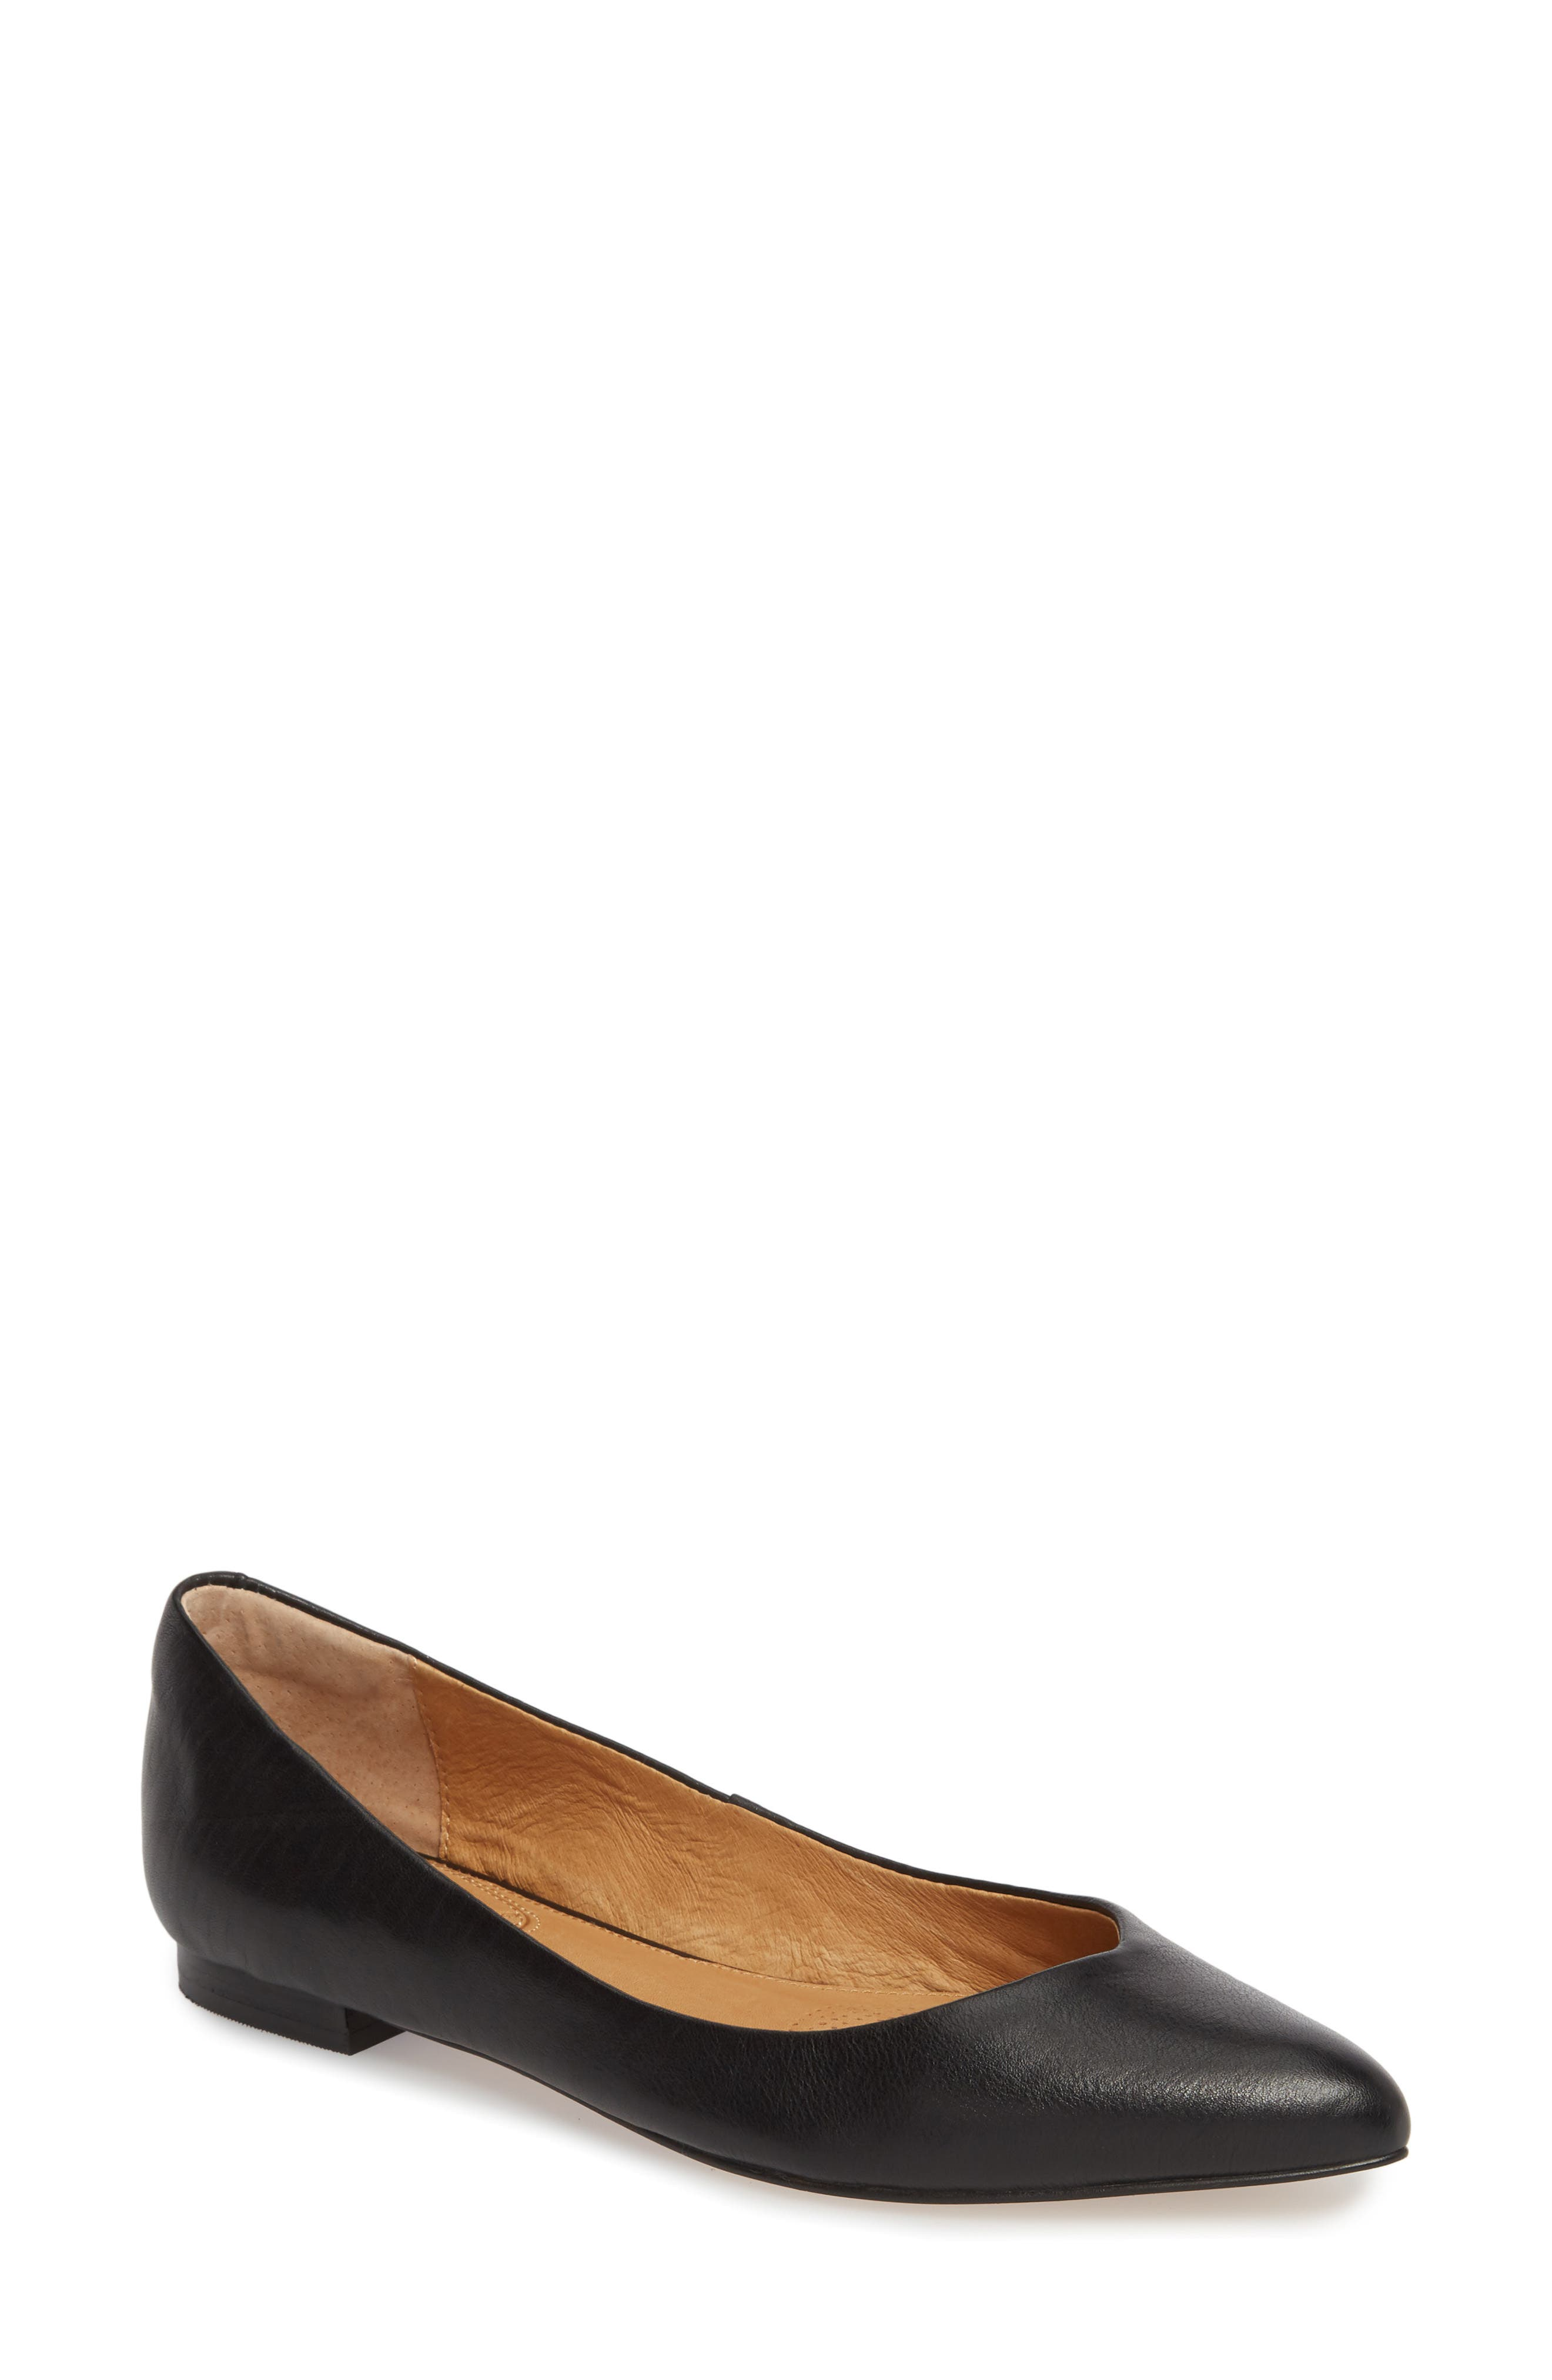 Jullia Flat,                         Main,                         color, Black Leather